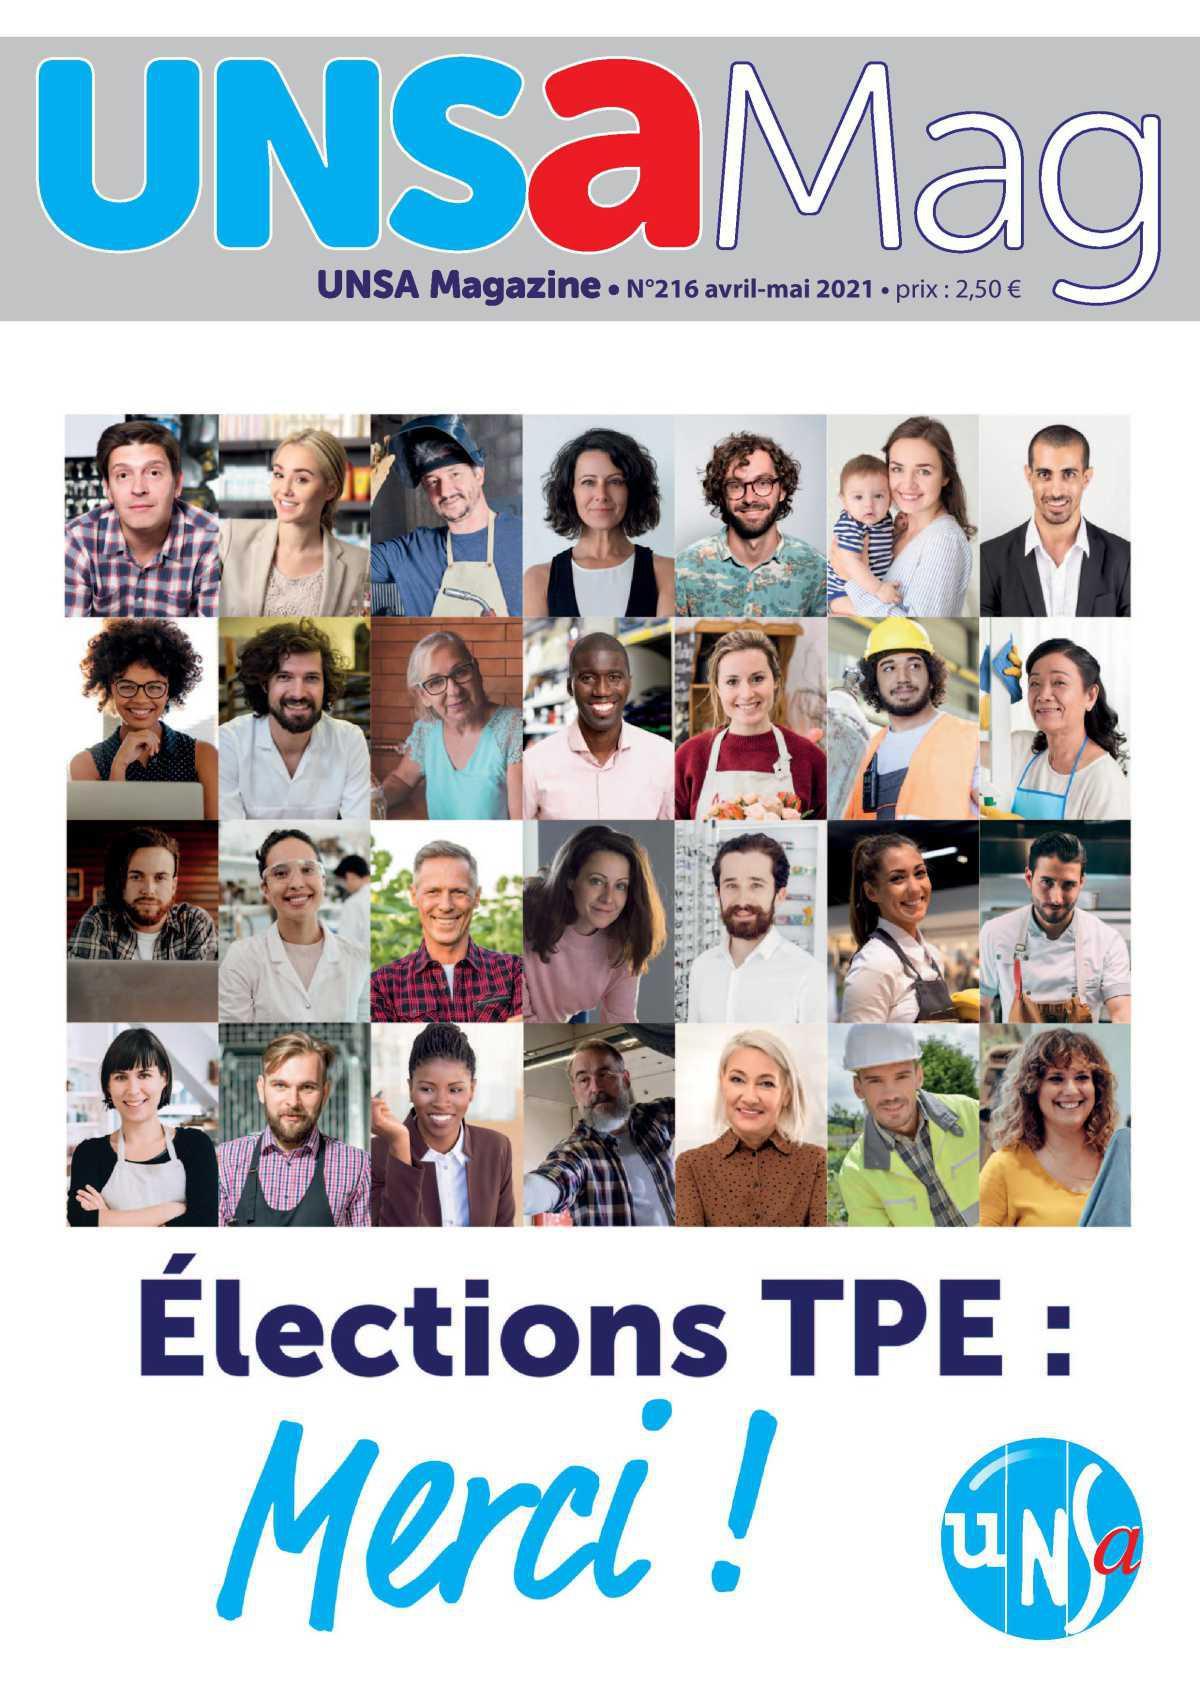 N°216 - Elections TPE : MERCI !